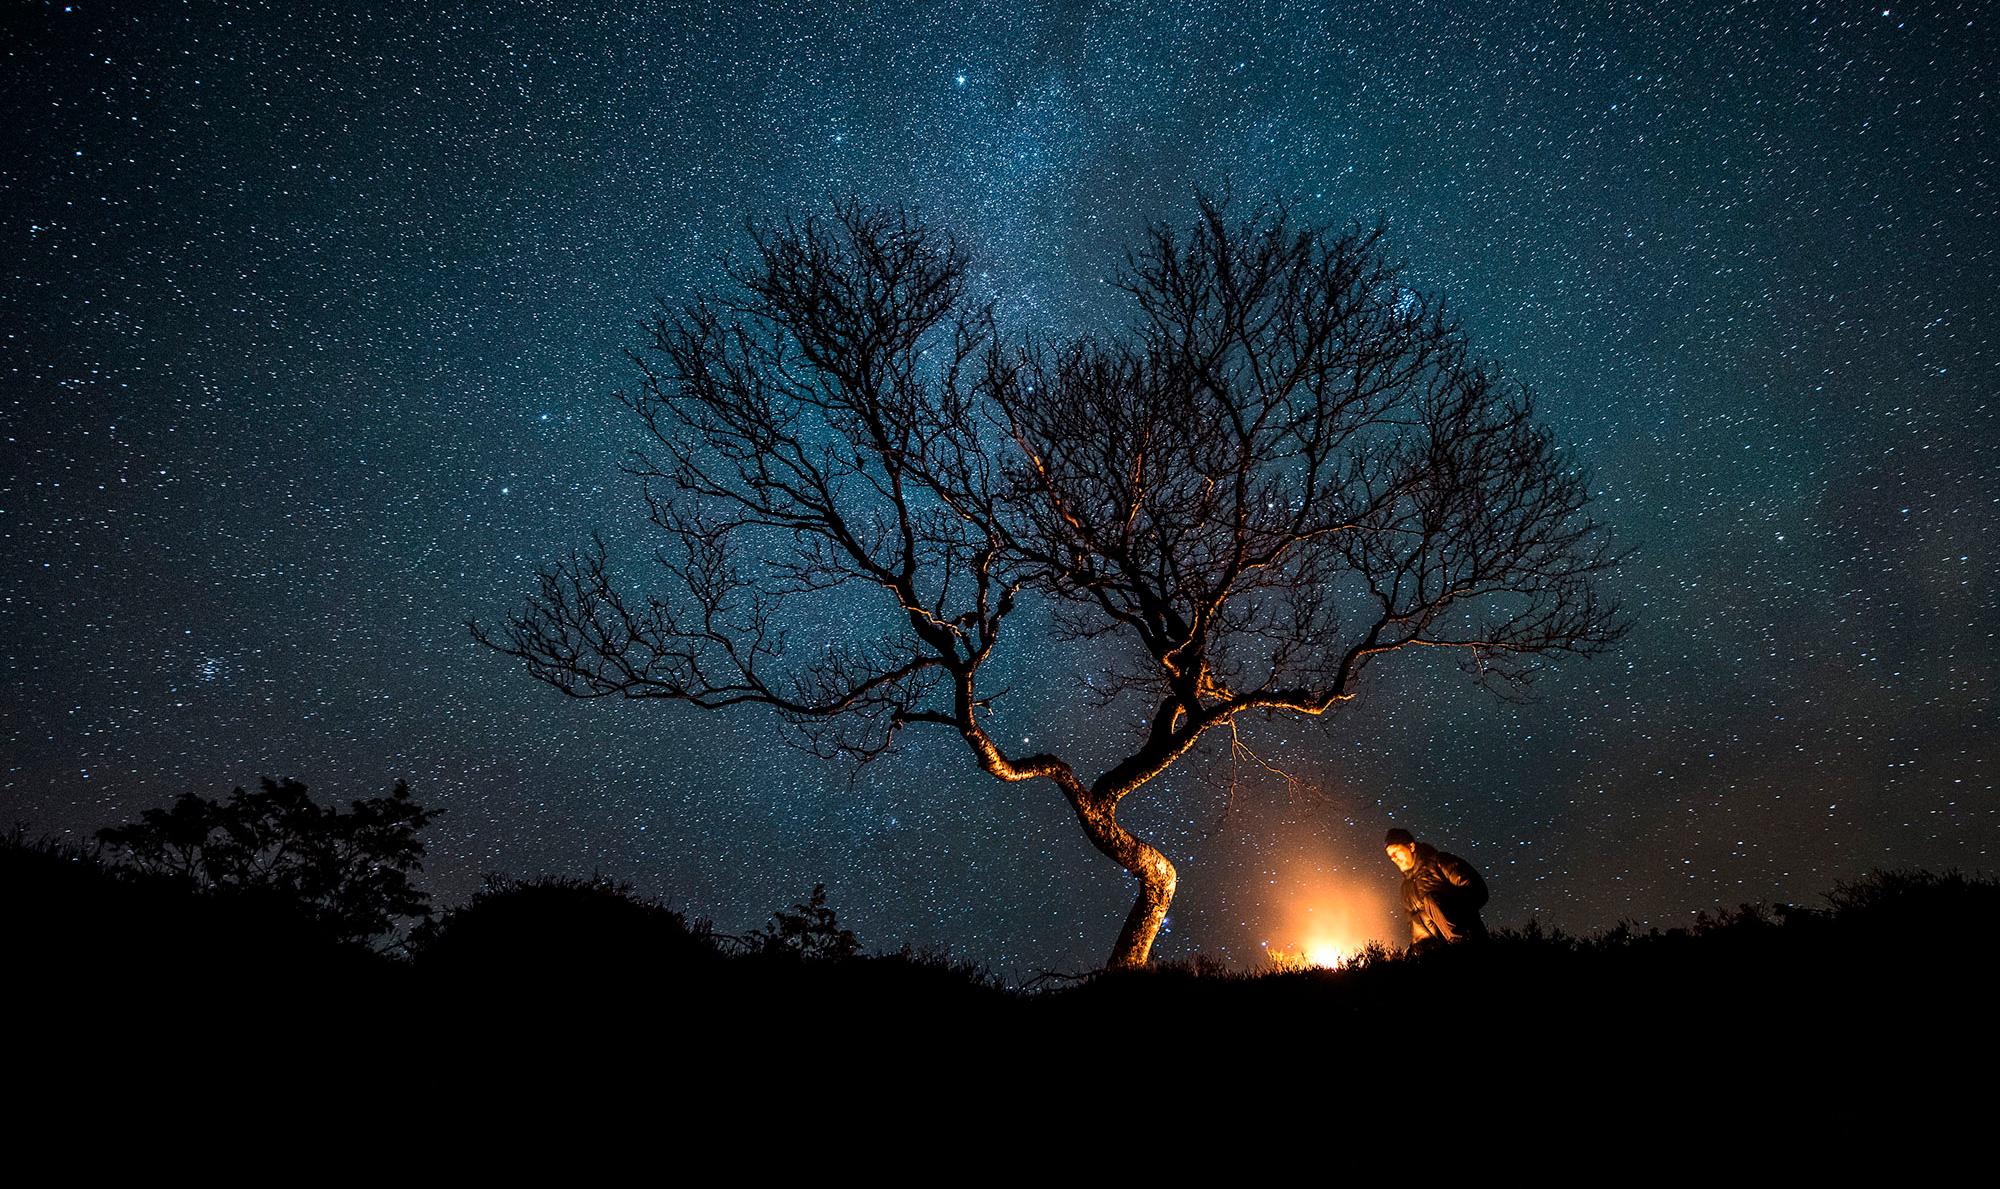 Image of starry night sky